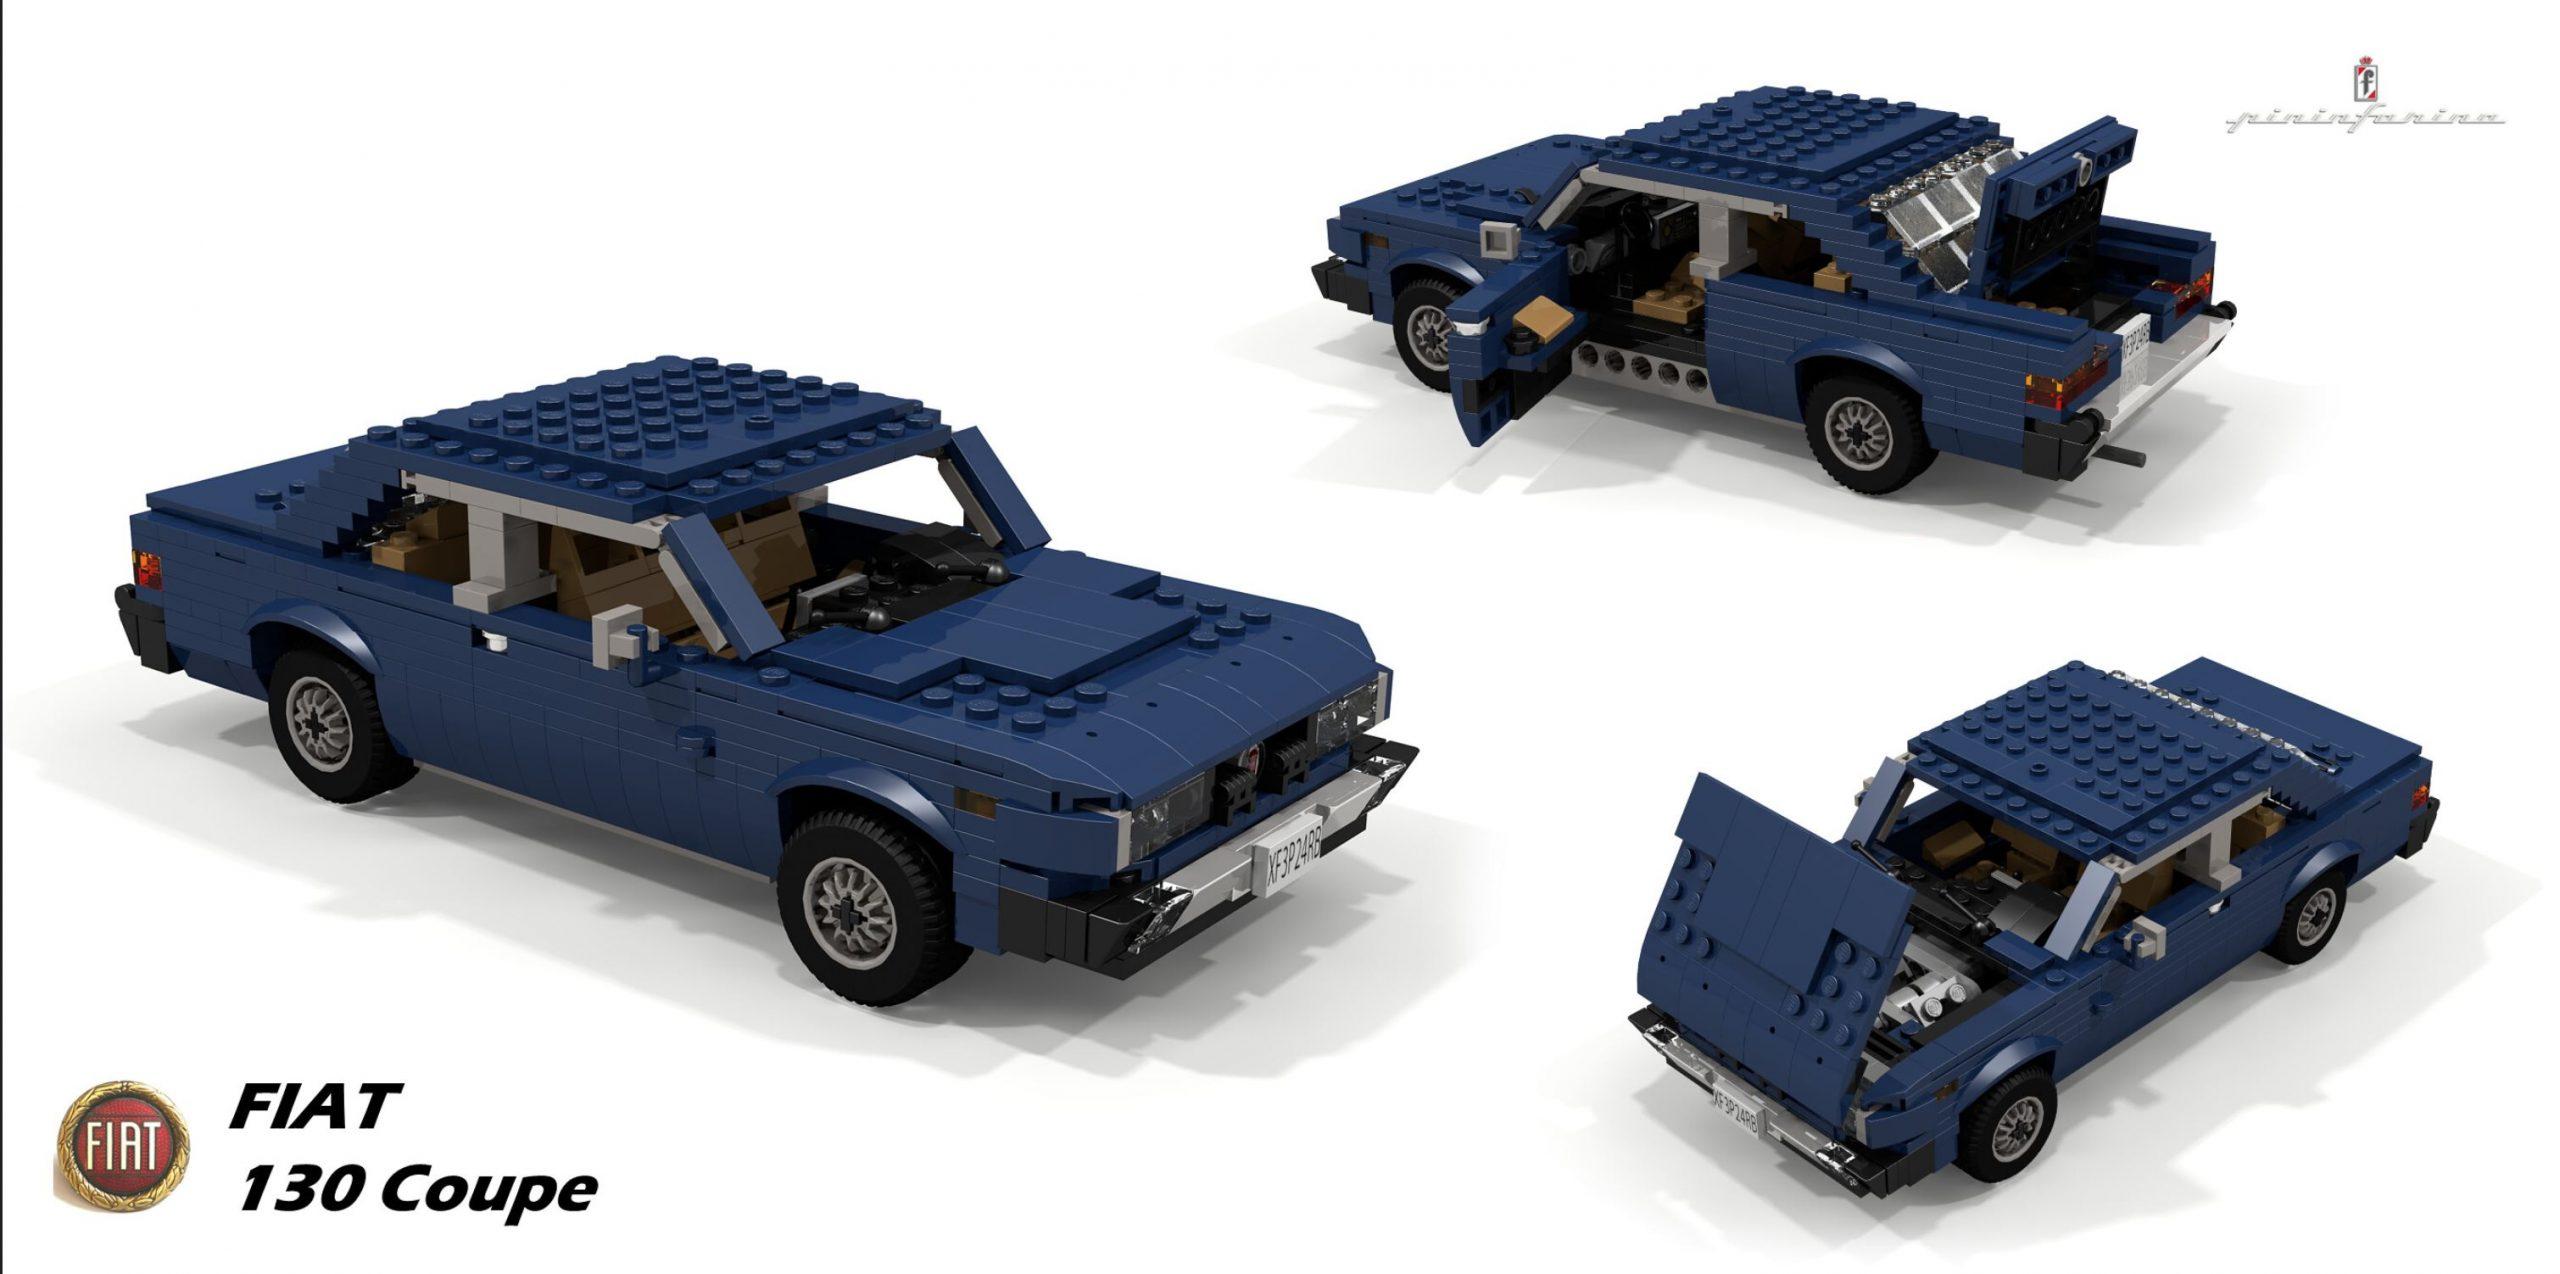 LEGO Fiat 130 Coupe